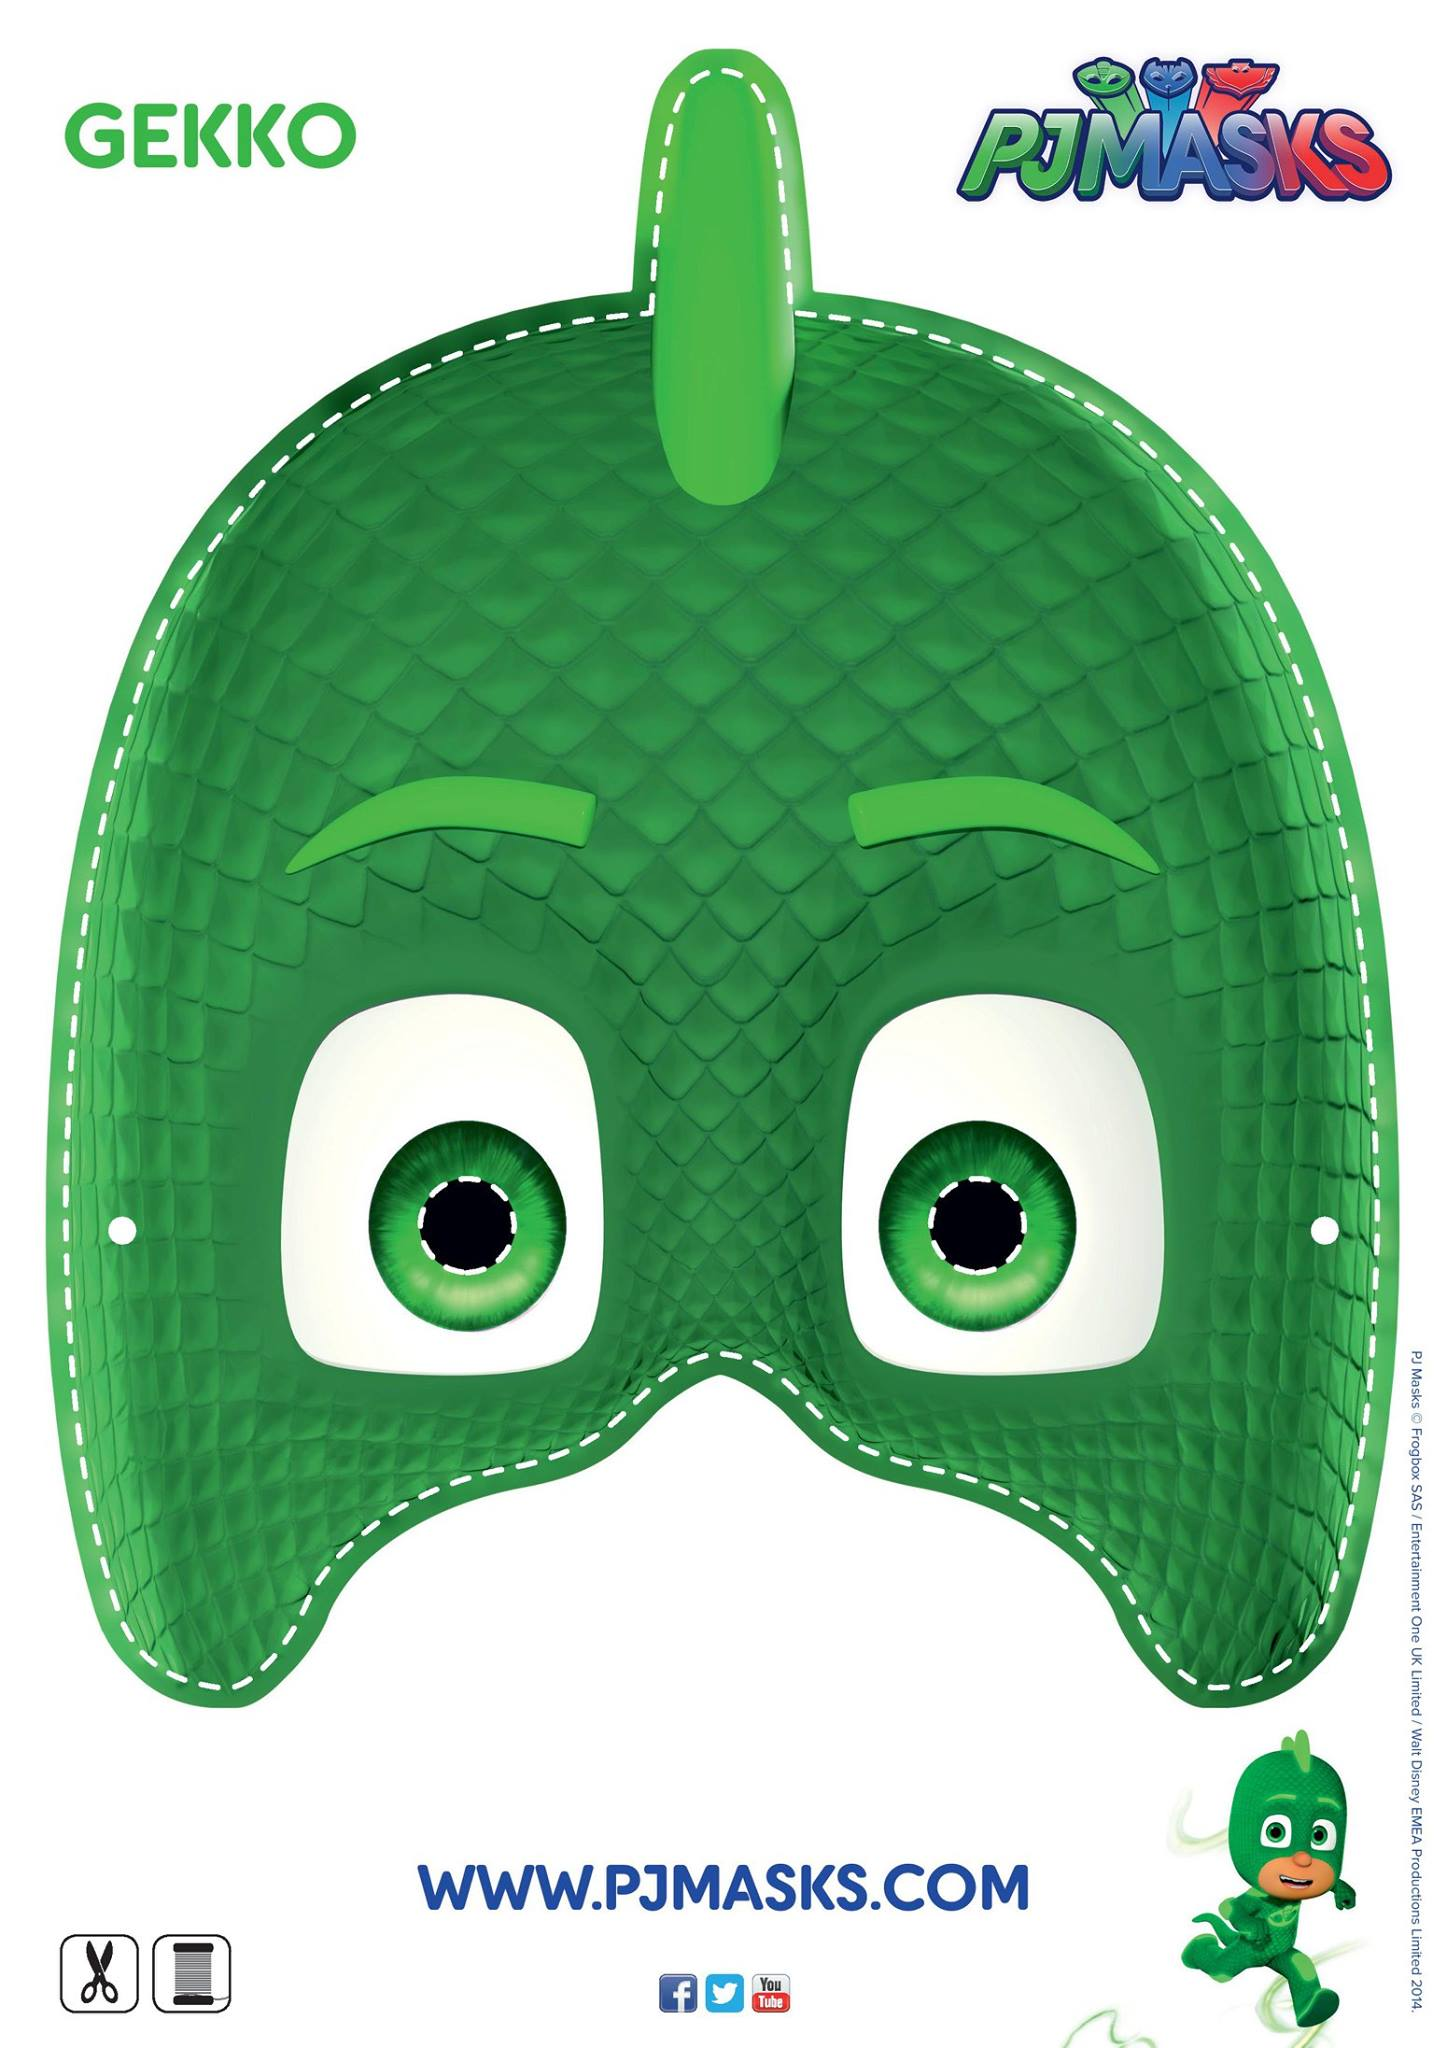 lembrancinhas cofrinho personalizado , lembrancinhas pj Masks , tema Pjmask , PJ Masks , tema aniversario PJ masks, tema Pjmask , lembrancinhas pjmask , aniversario do PJMASKS